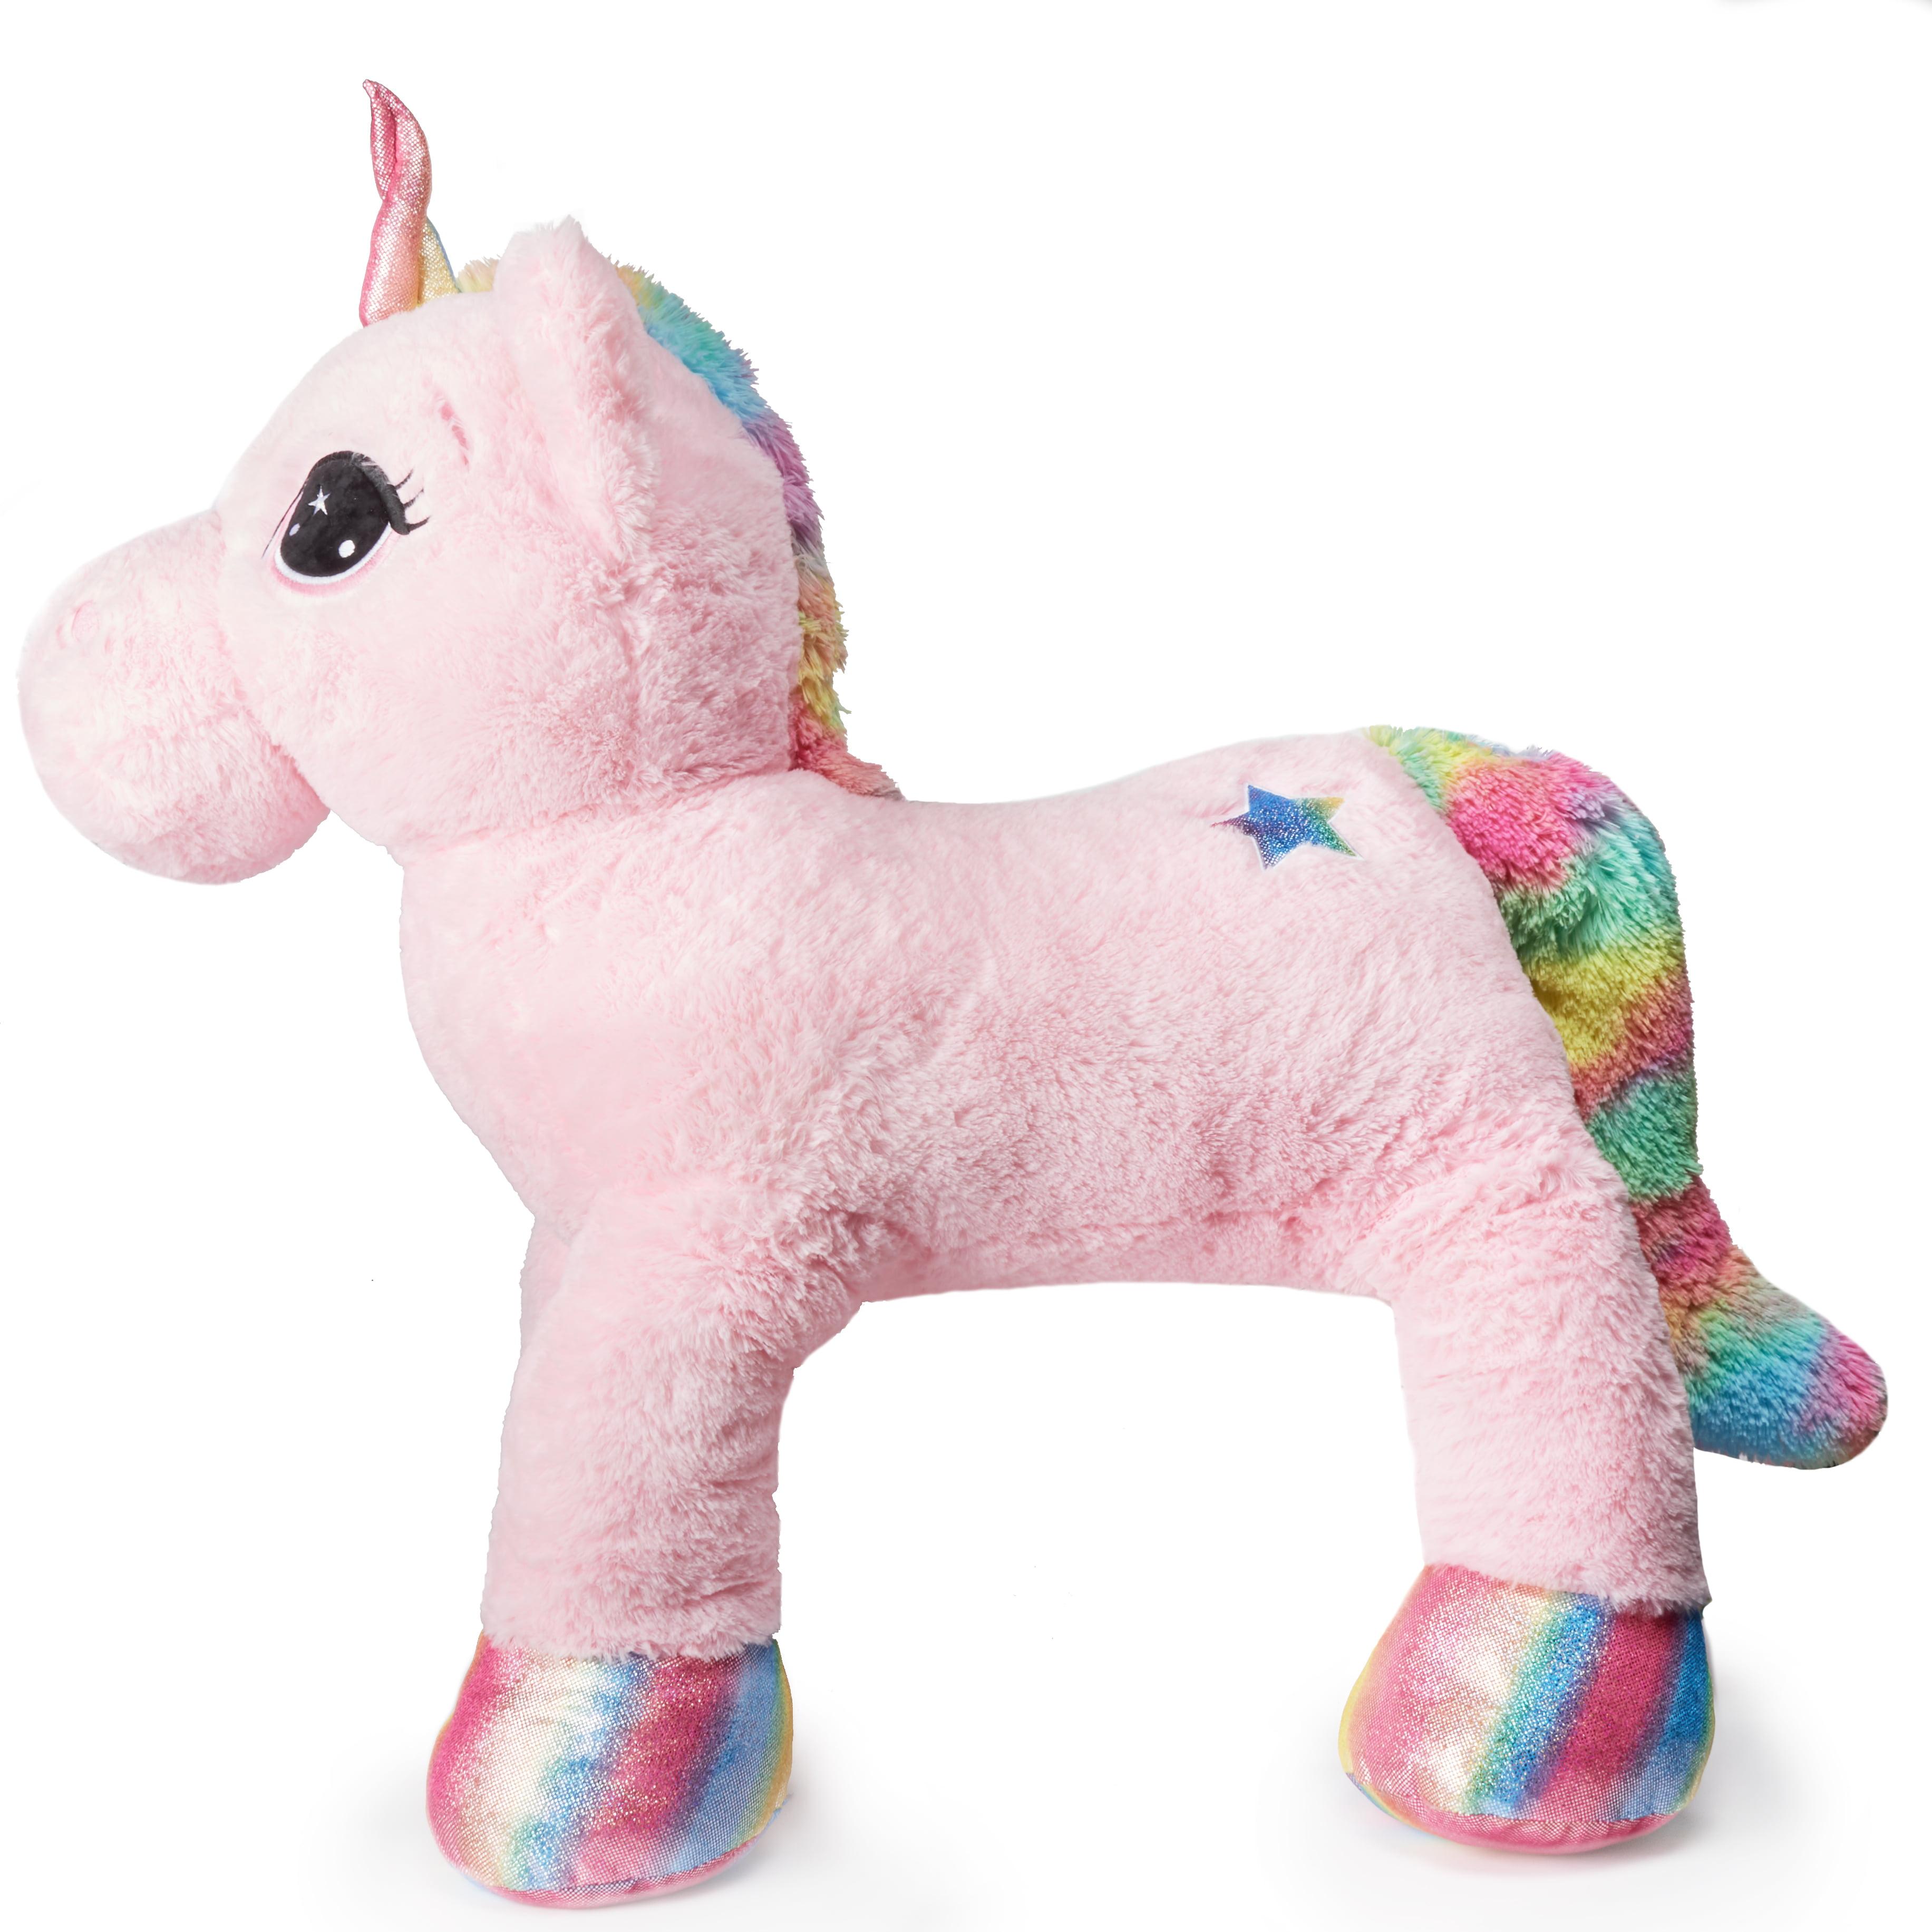 Giant Plush Unicorn 25 Walmart Com